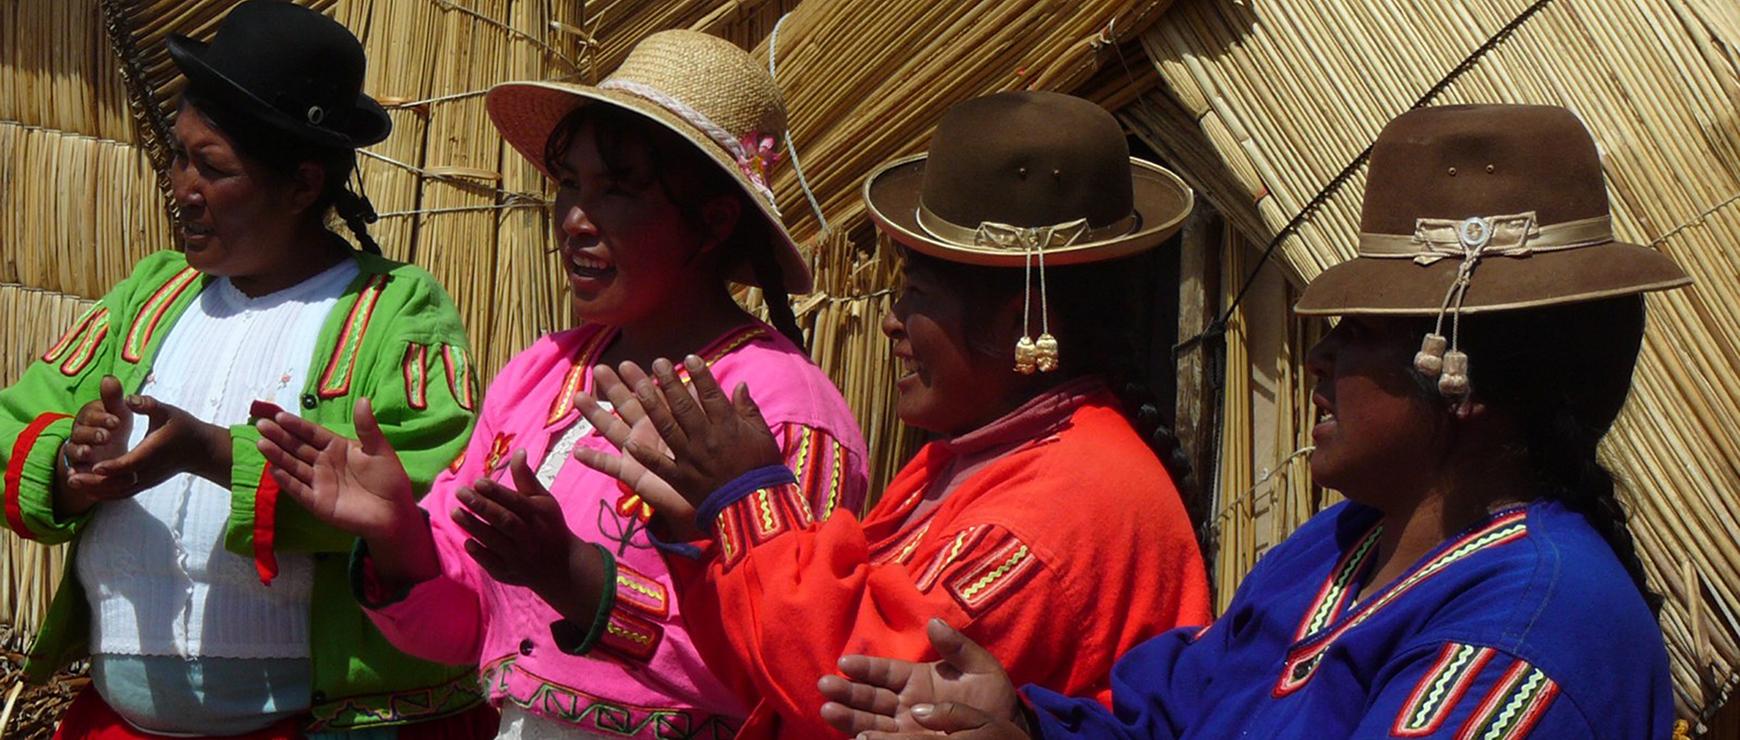 Femmes Uros - Titicaca - Pasion Andina